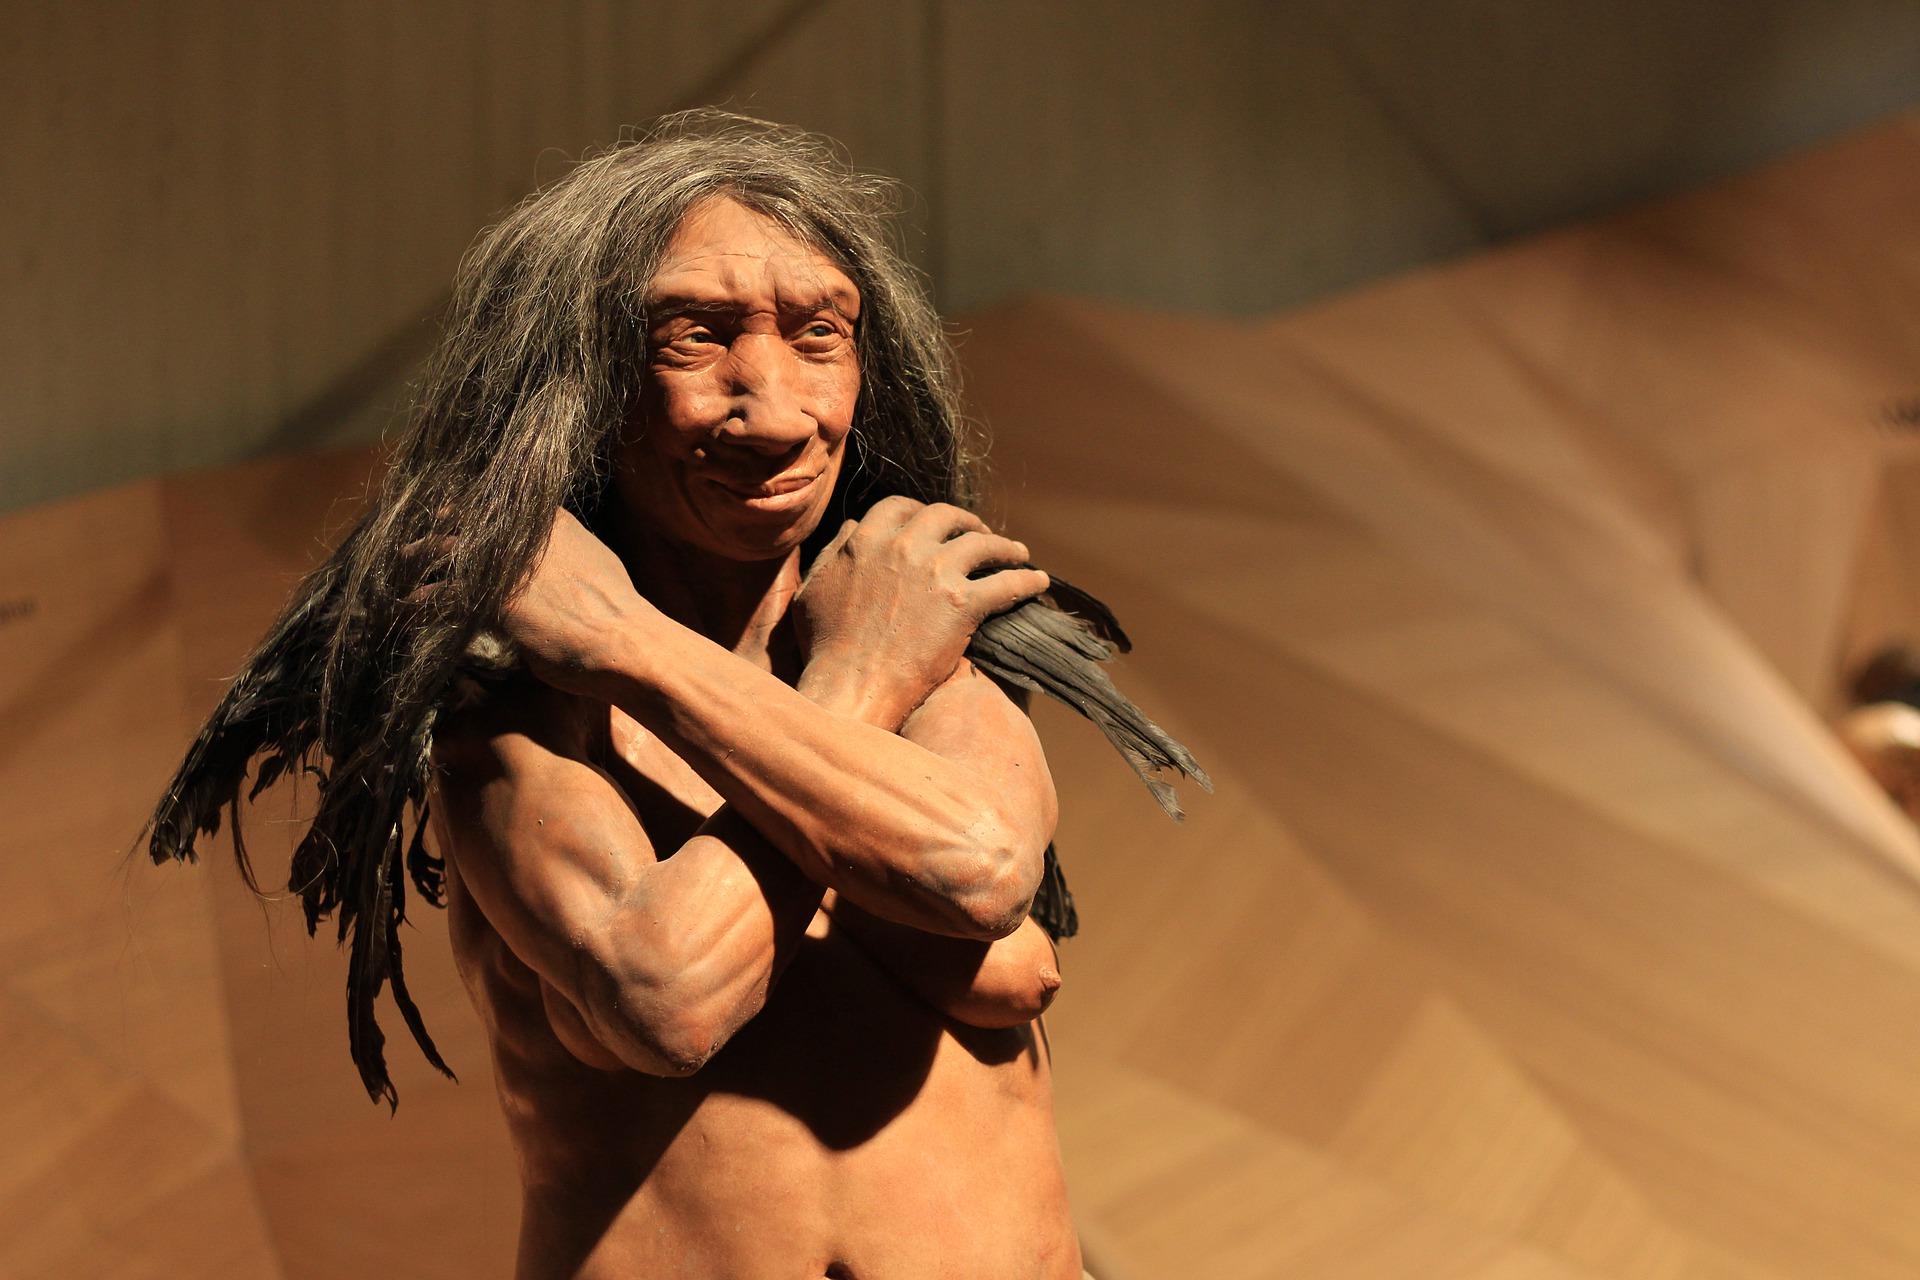 Neanderthal Tools, Neanderthal Tool Use